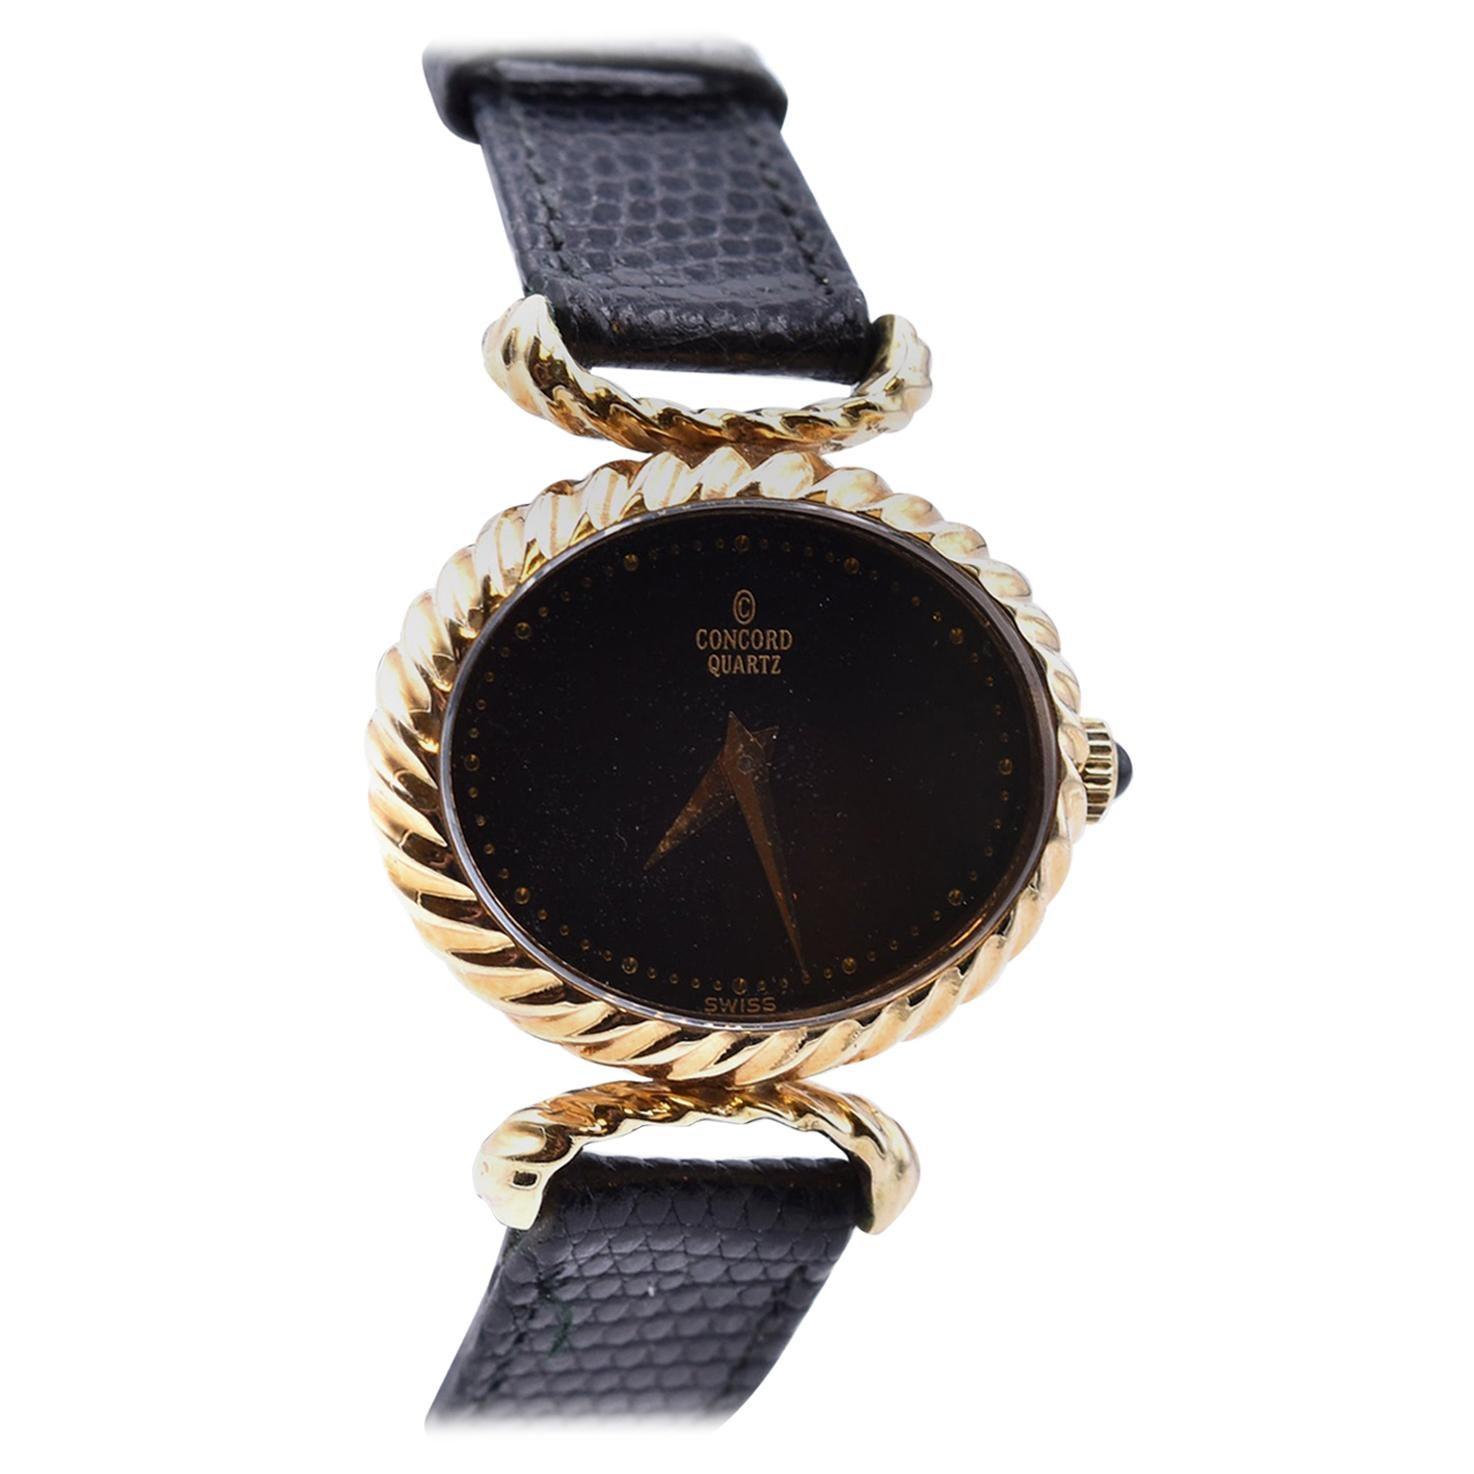 Concord 14 Karat Yellow Gold Oval Watch